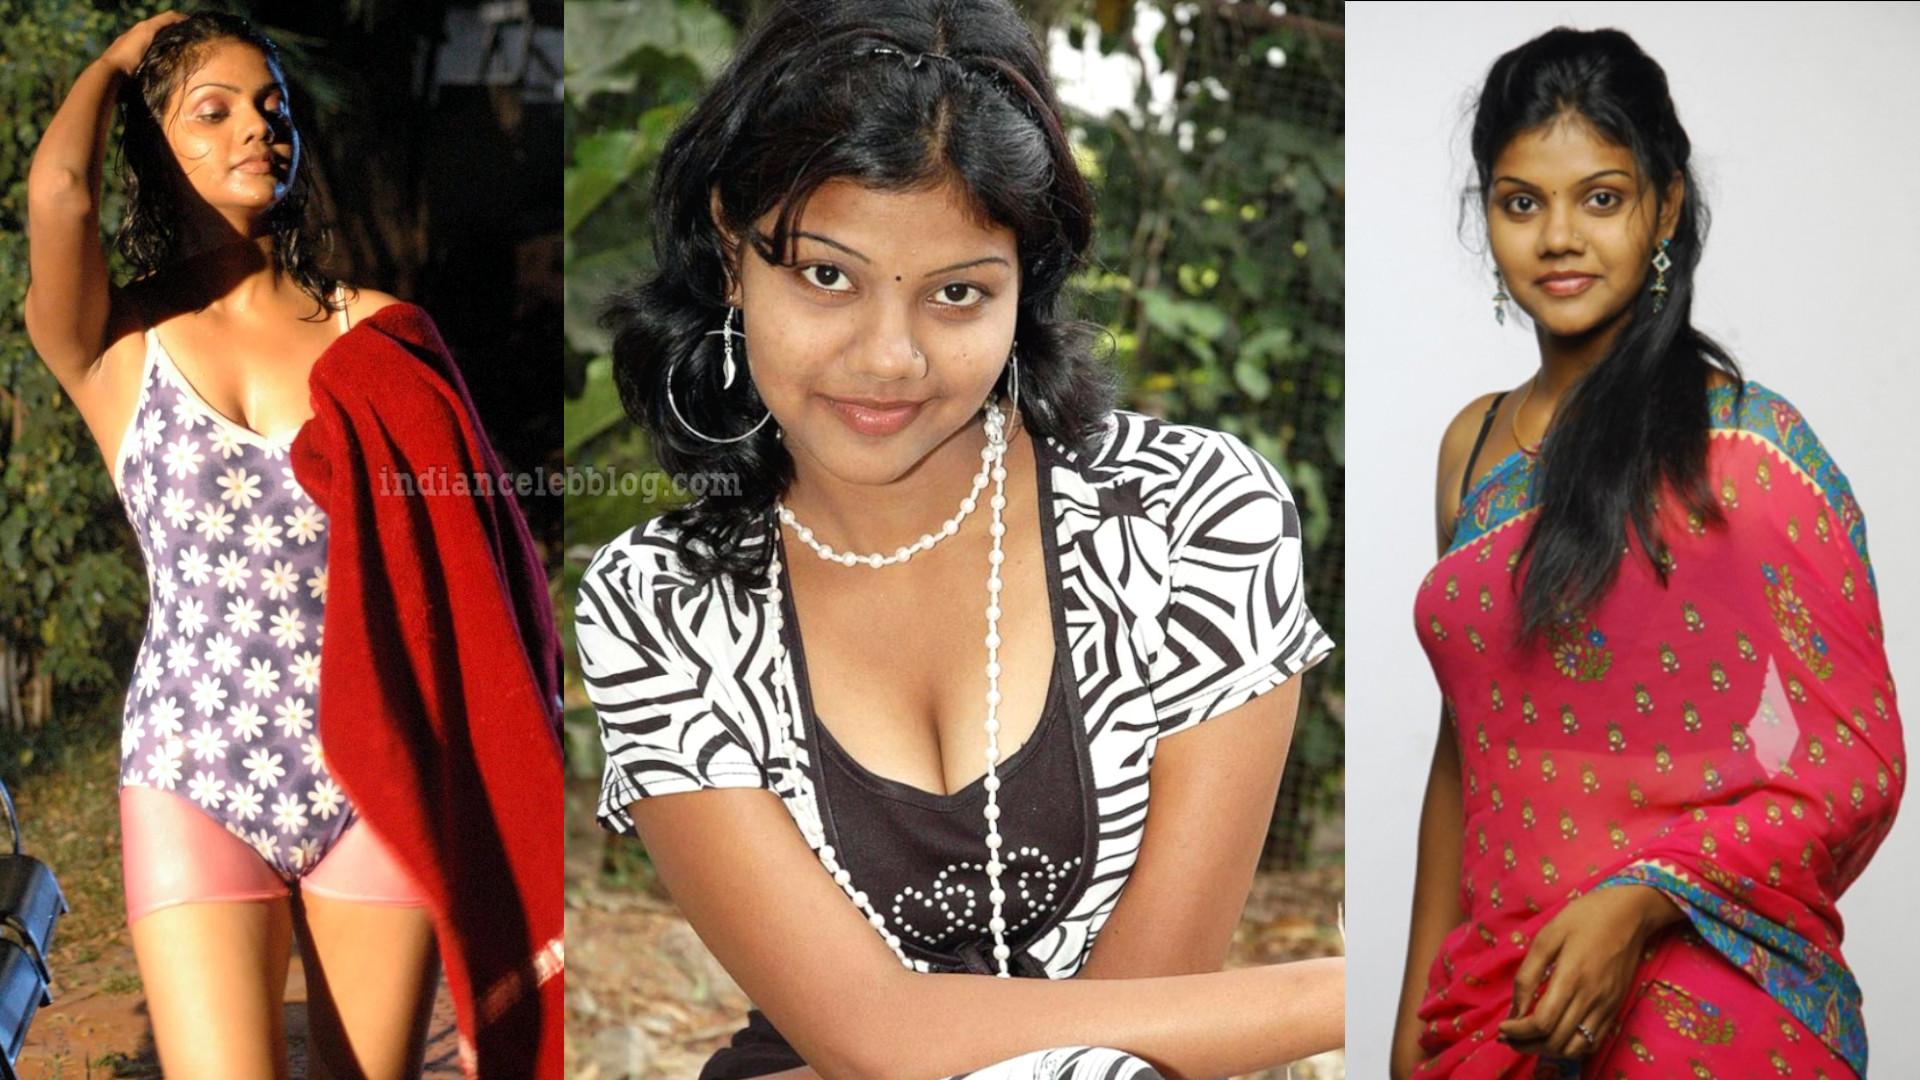 Amrita gowri telugu VJ and serial actress hot stills